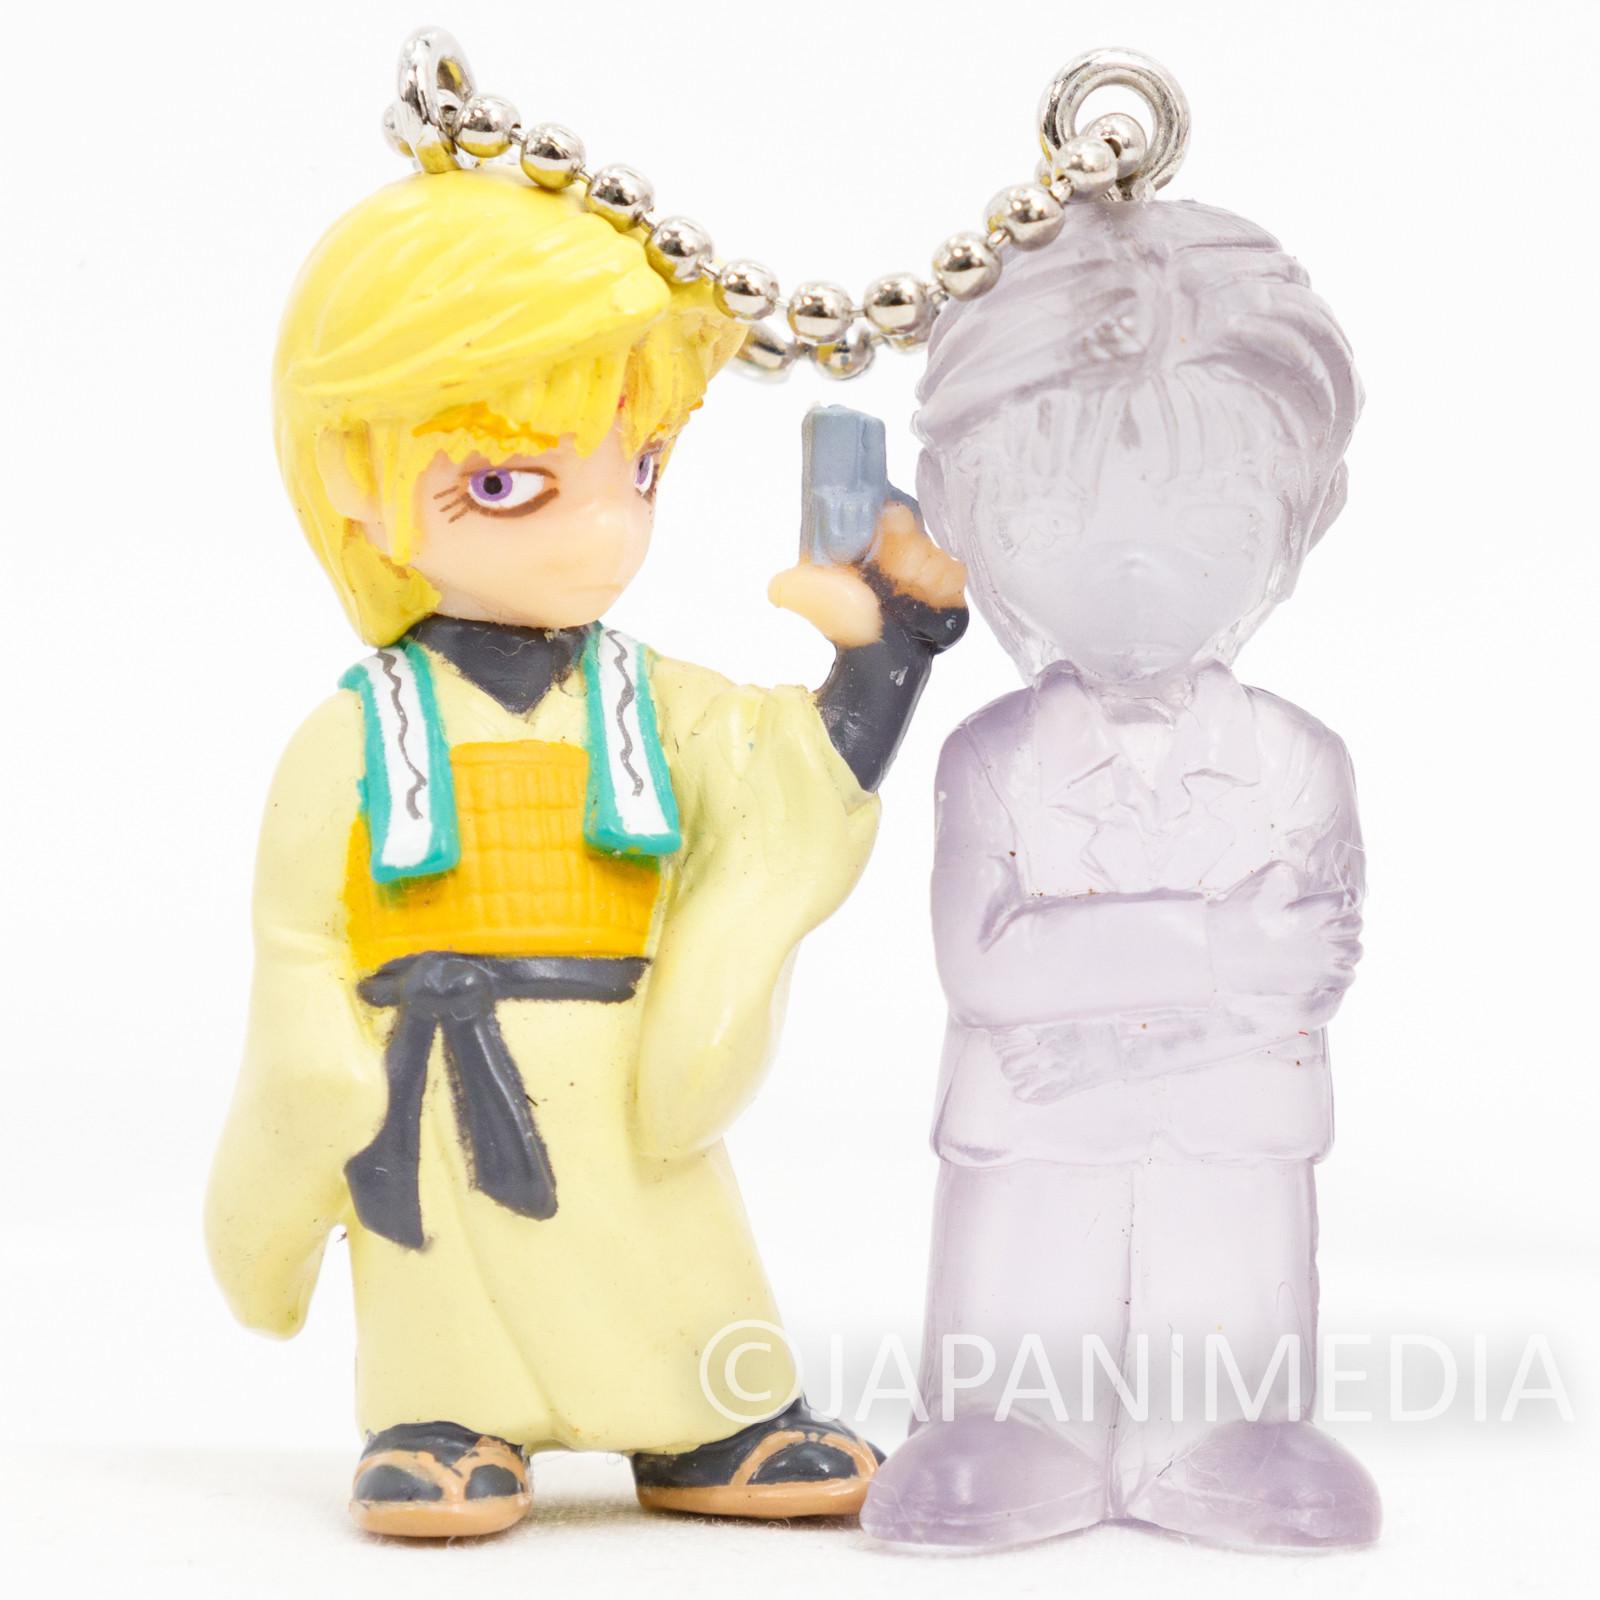 Gensomaden SAIYUKI Genjo Sanzo Mascot Figure Twin Keychain JAPAN ANIME MANGA 2